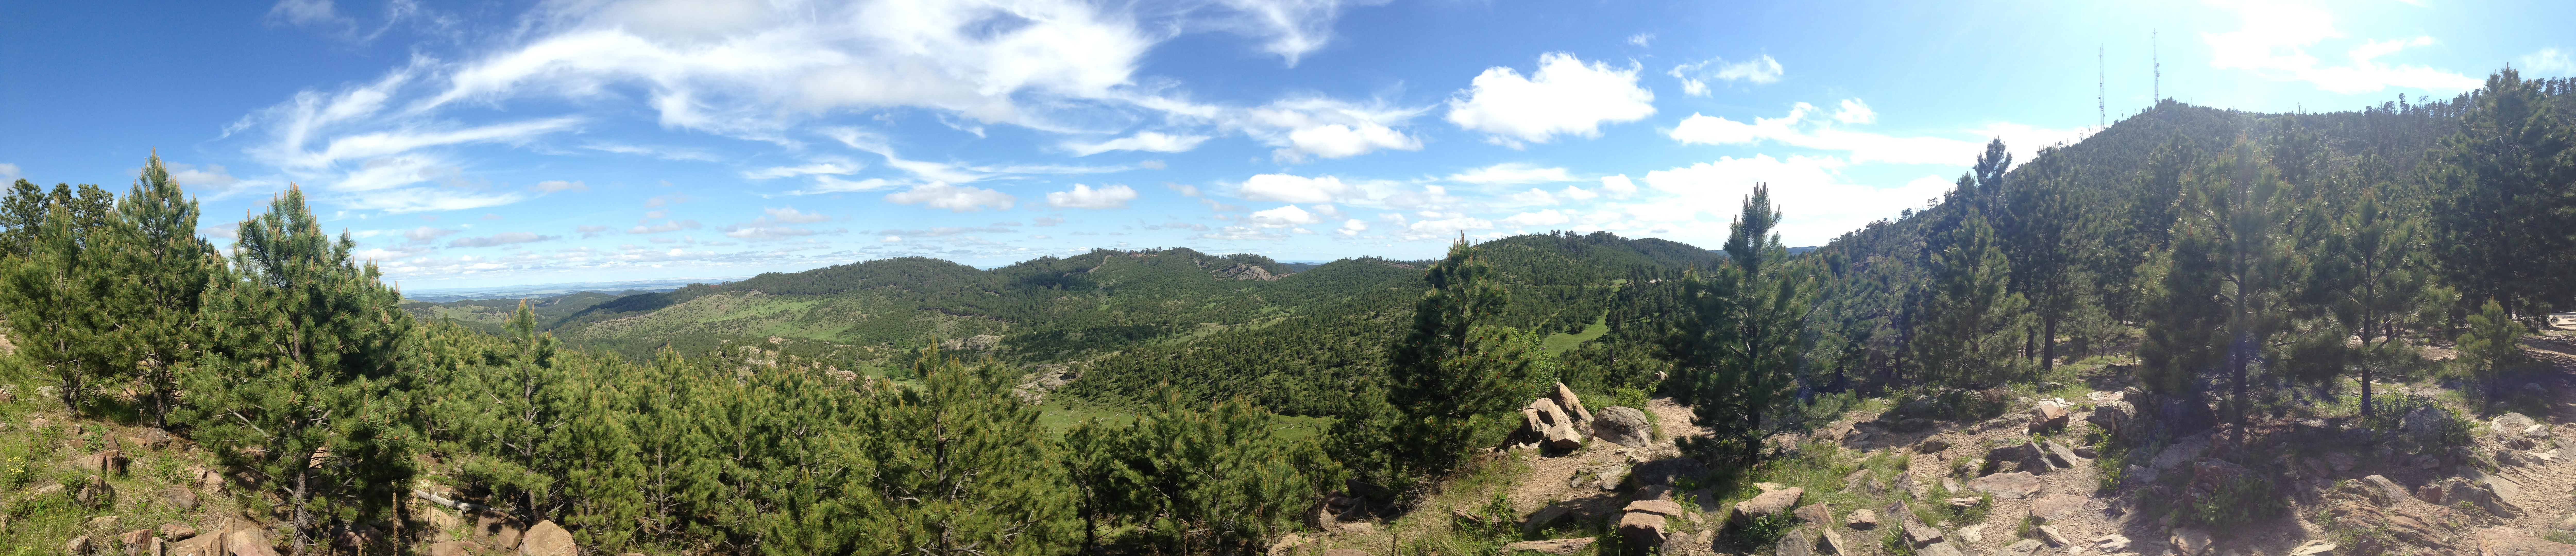 Panorama in the Hills   Delightful Crumb